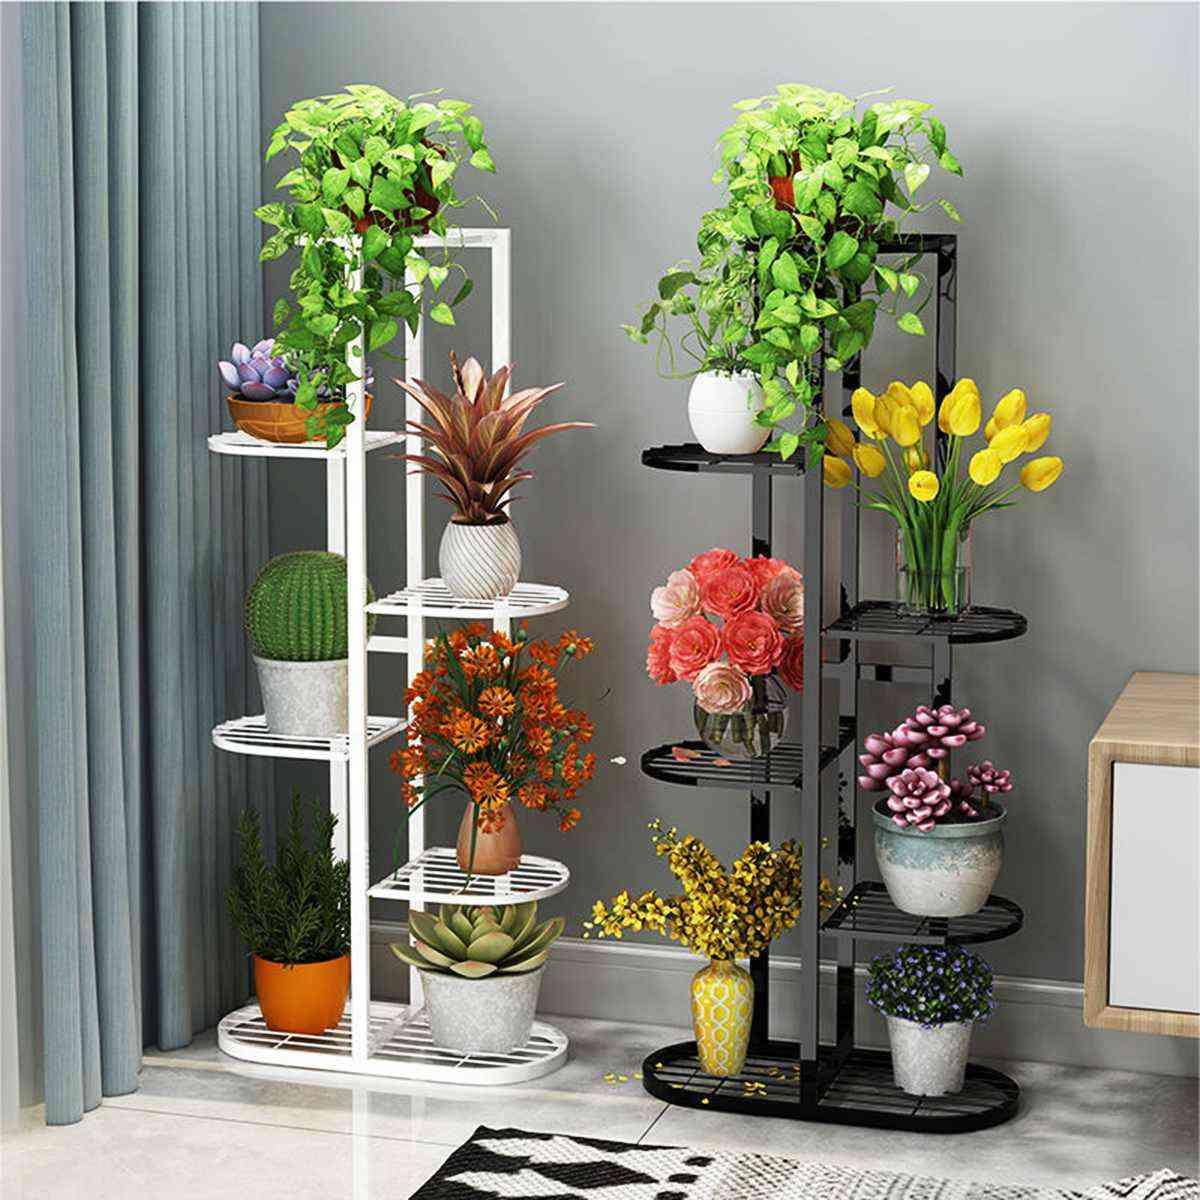 Plant Shelves, Iron Potted, Flower Stand, Rack, Multiple Pot Holder Shelf, Indoor, Outdoor, Display Organizer